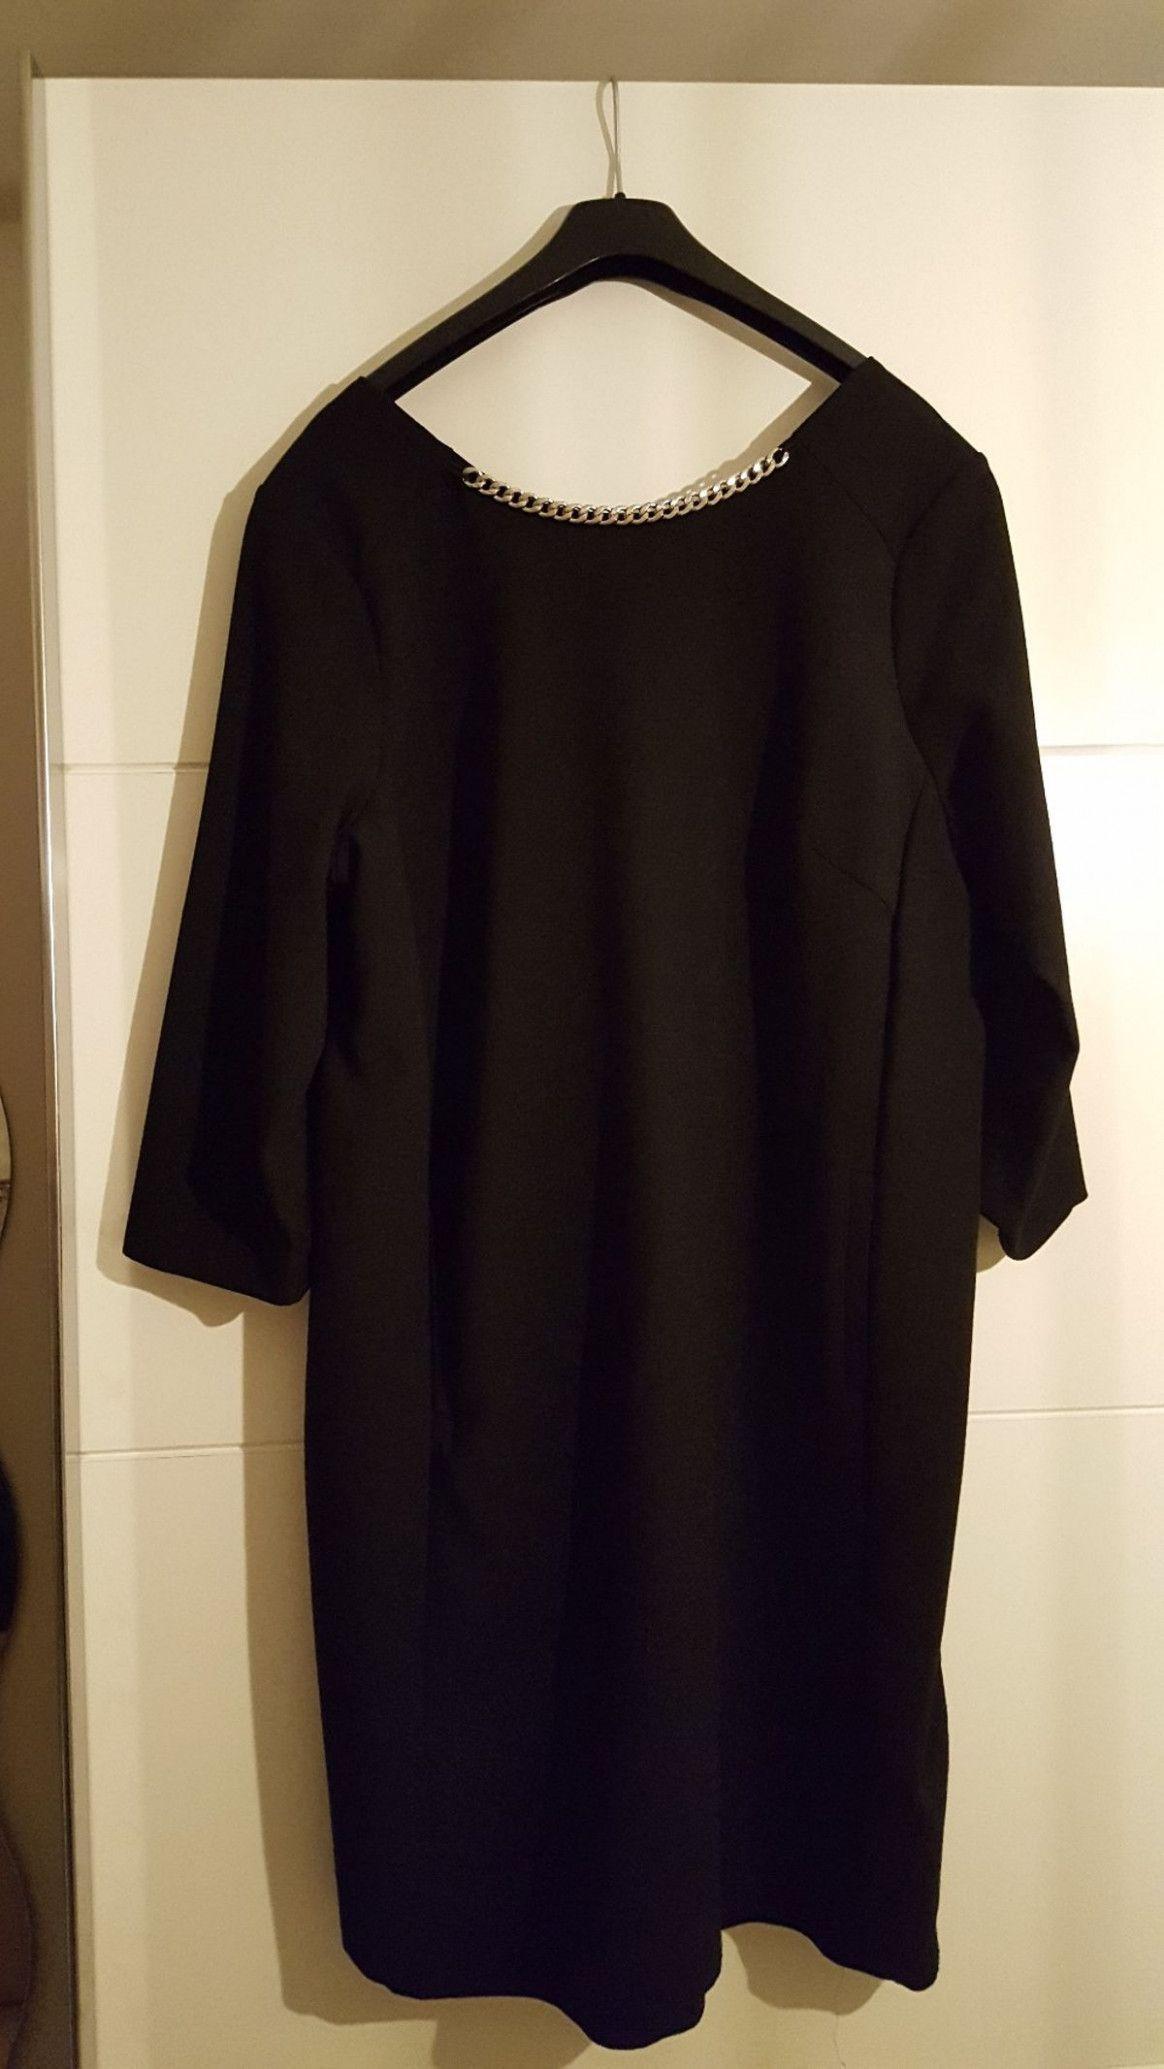 13 etuikleid xxl in 2020 | schwarzes kleid, kleider, etuikleid